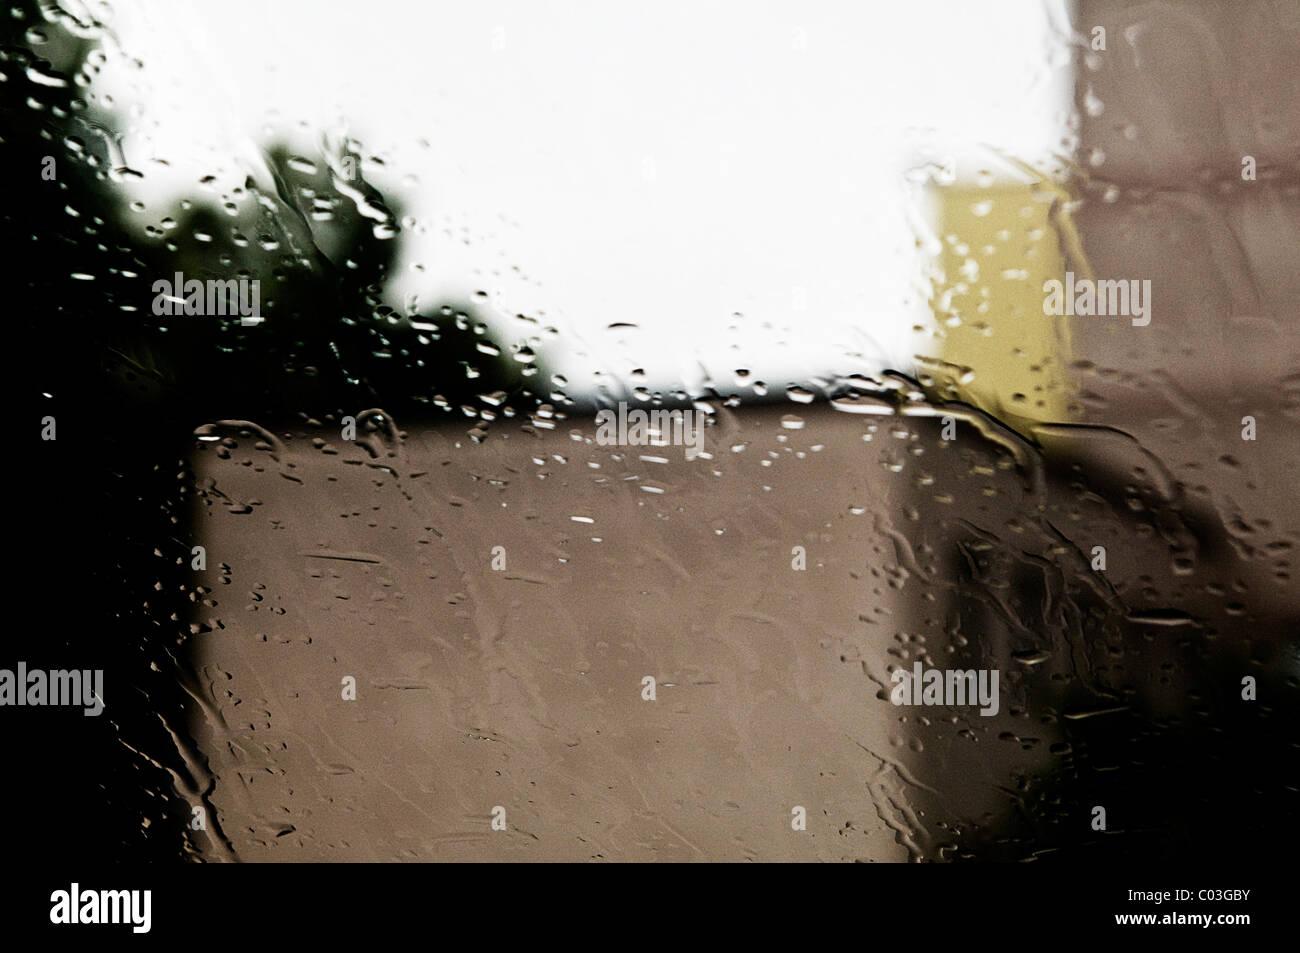 Looking through a rain-soaked window pane Stock Photo